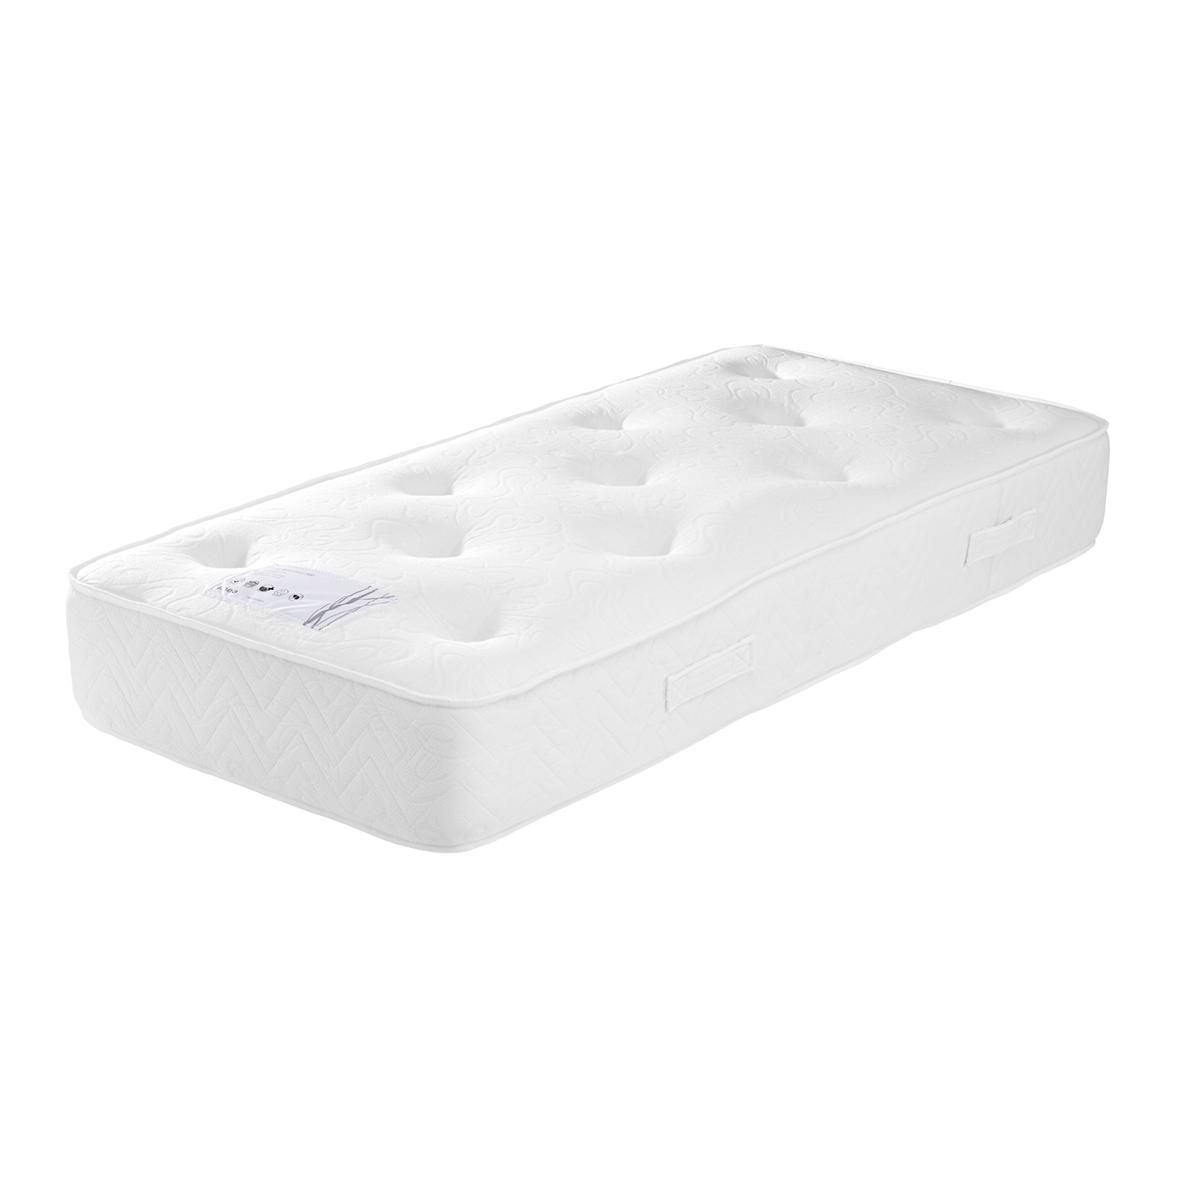 threshold green trim memory mat width by glideaway height products t item twin gel foam mattresses mats mattress youth